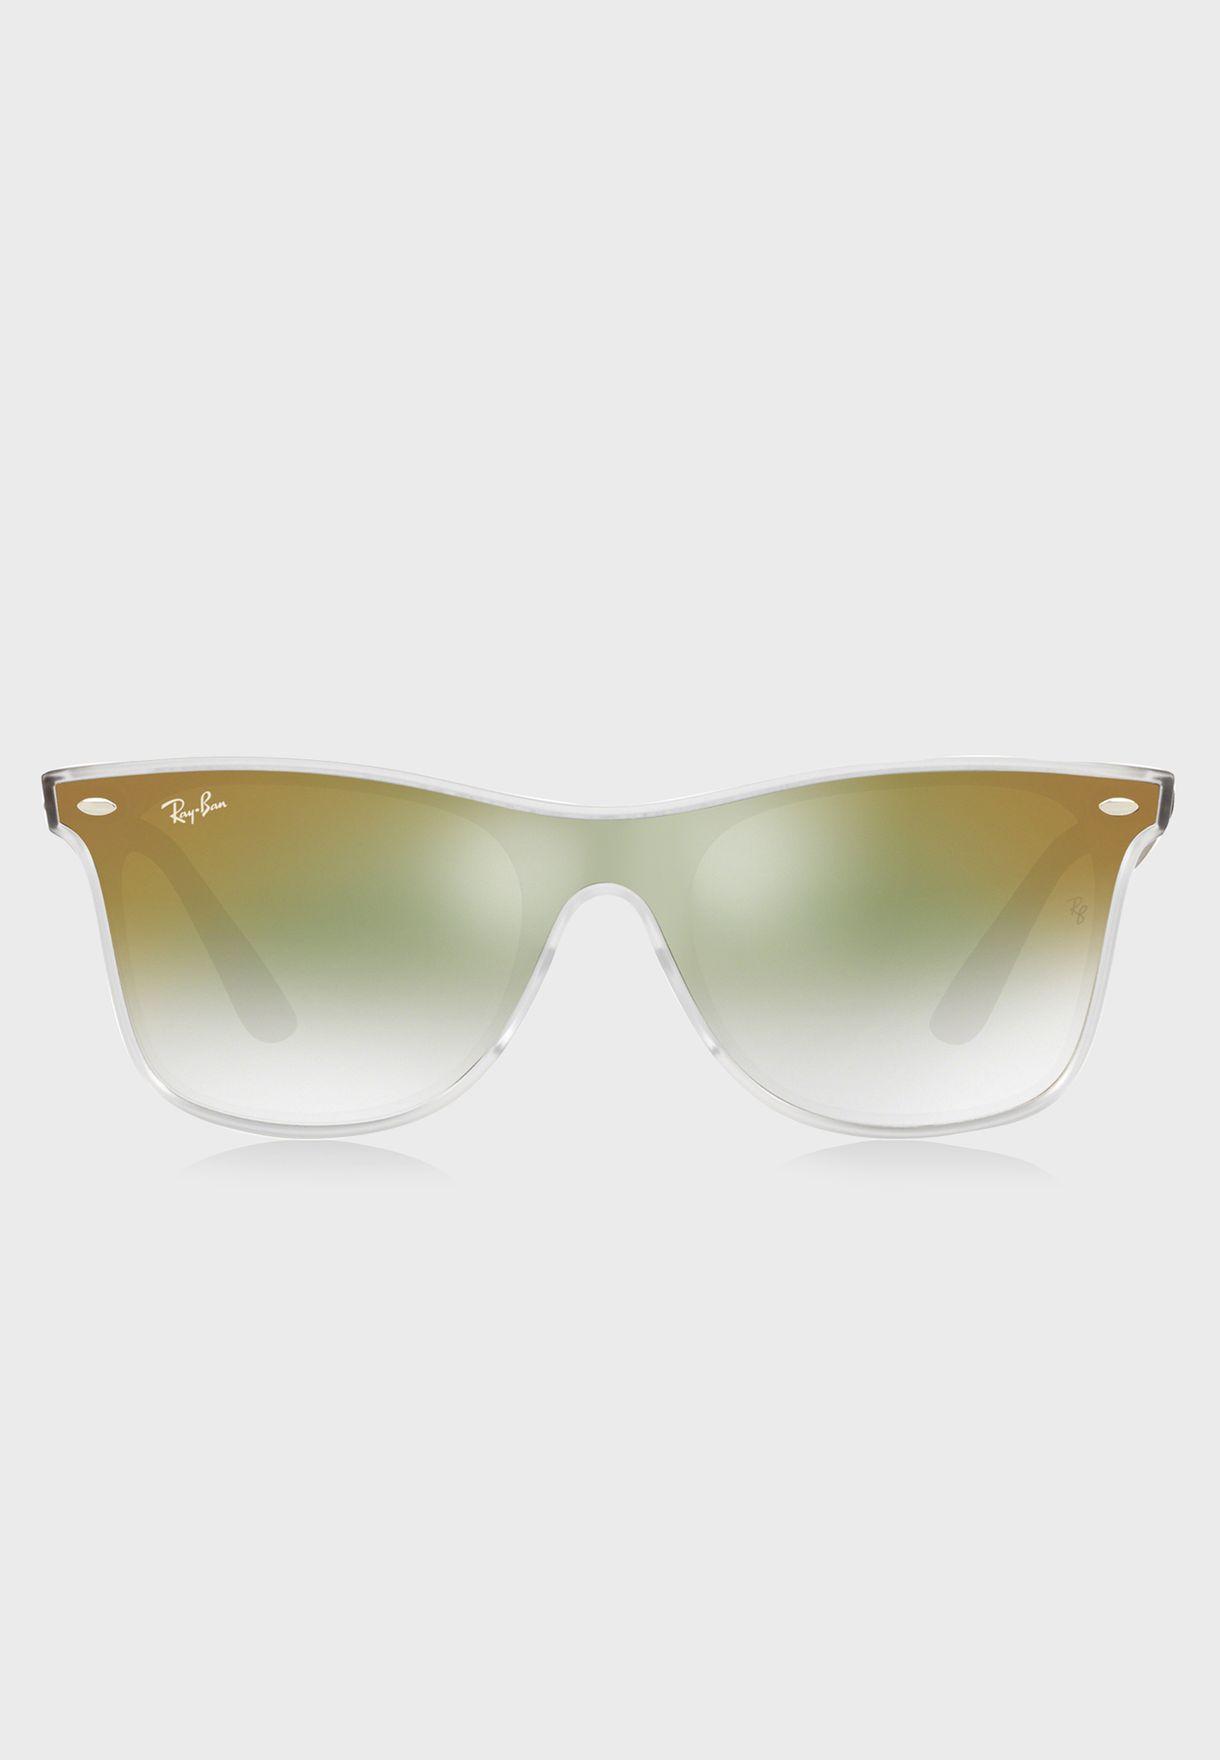 a7a84fa484 Shop Ray-Ban green 0RB4440N Blaze Wayfarer Sunglasses 8053672919103 ...